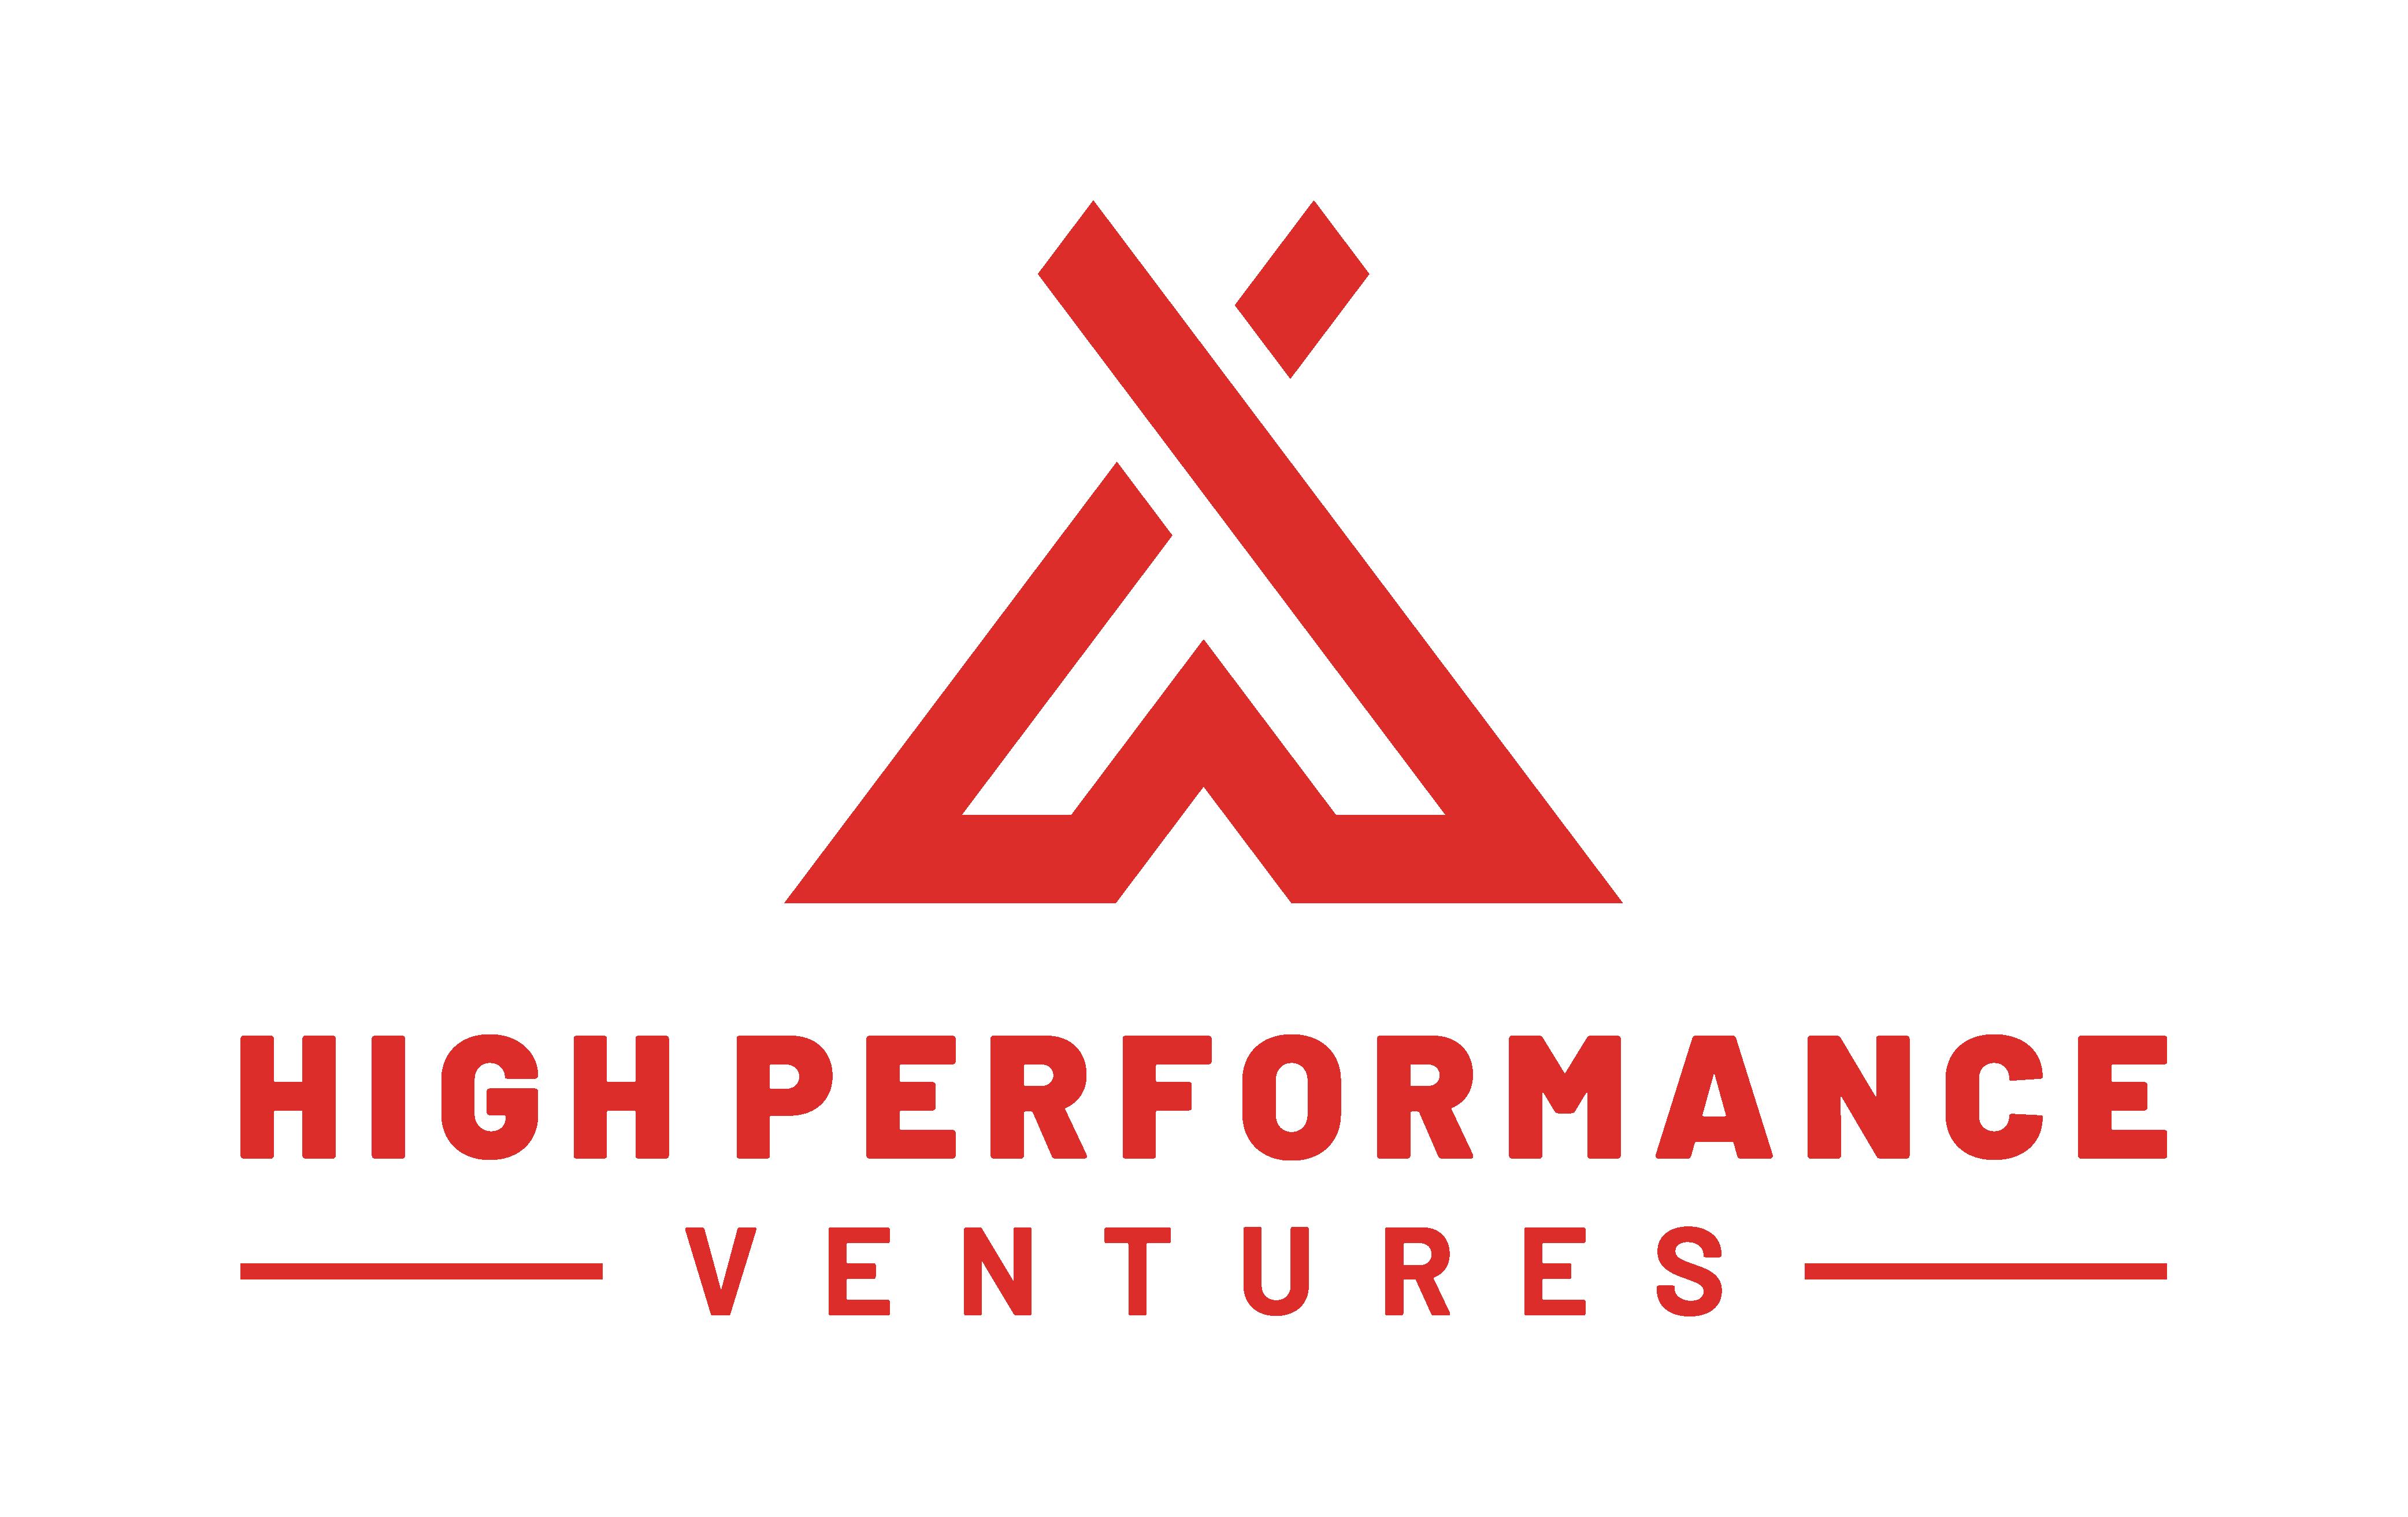 High Performance Ventures